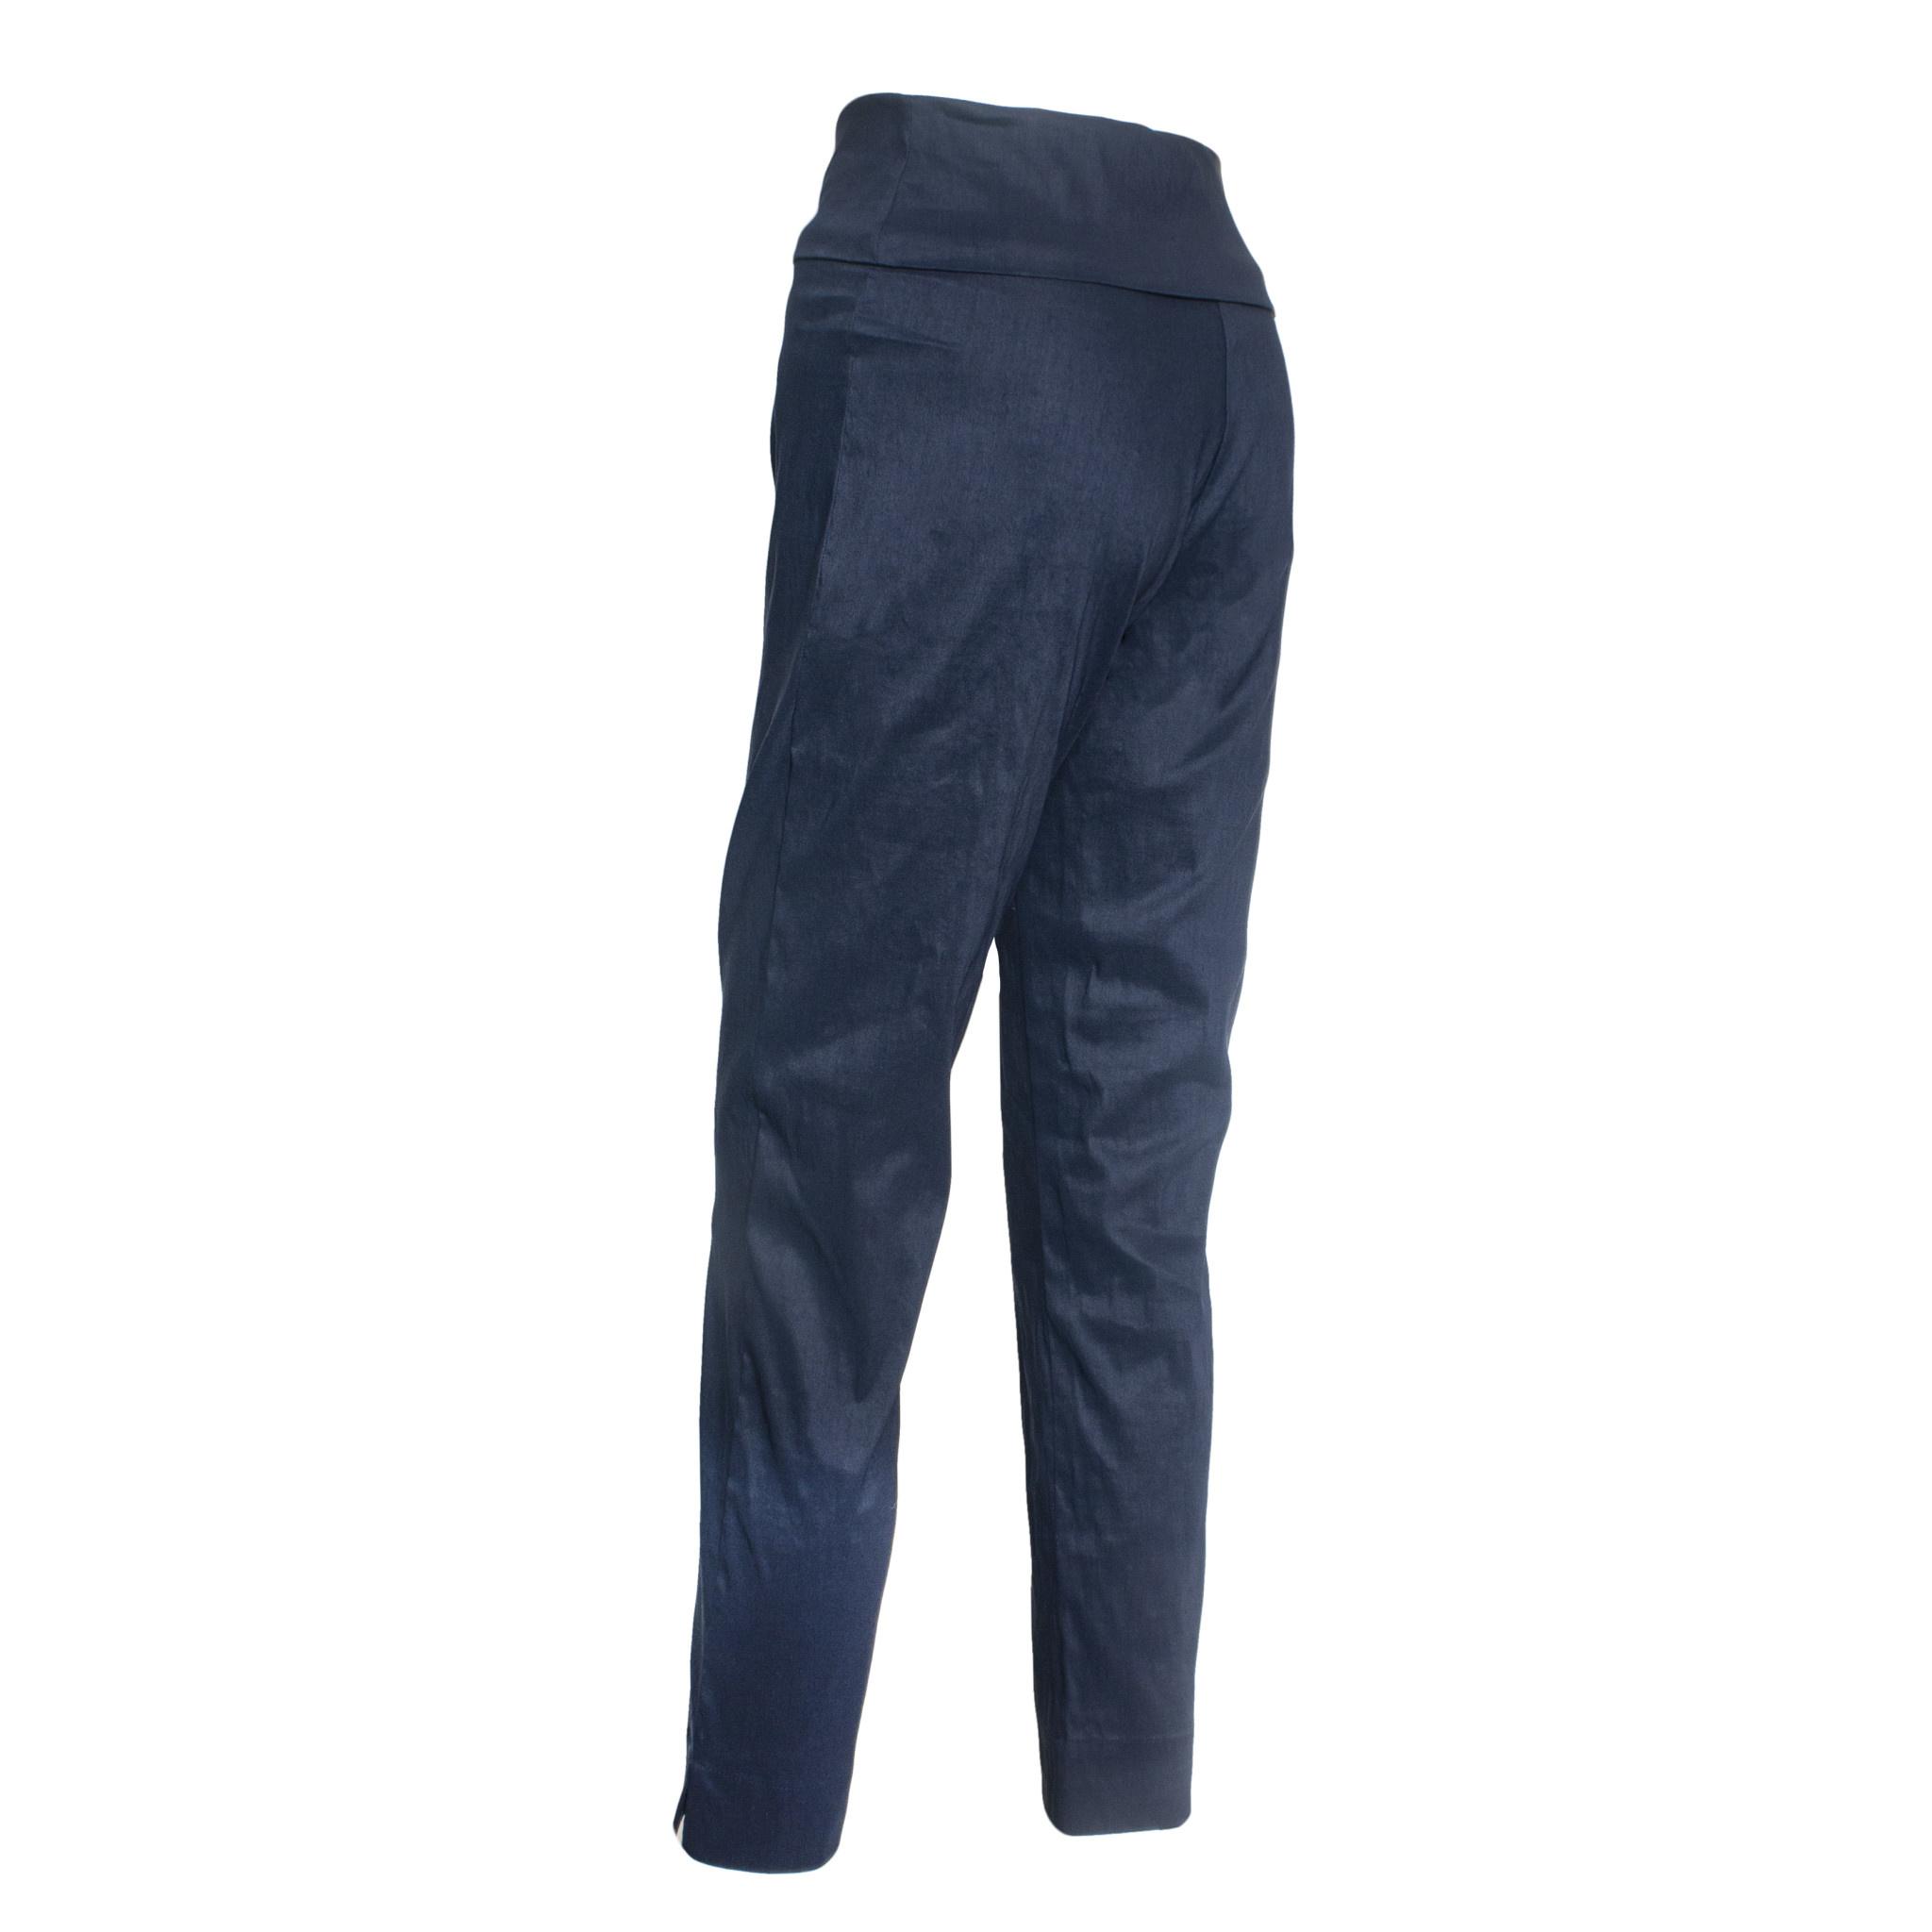 Crea Concept Concept Crepe Foldover Pants - Navy